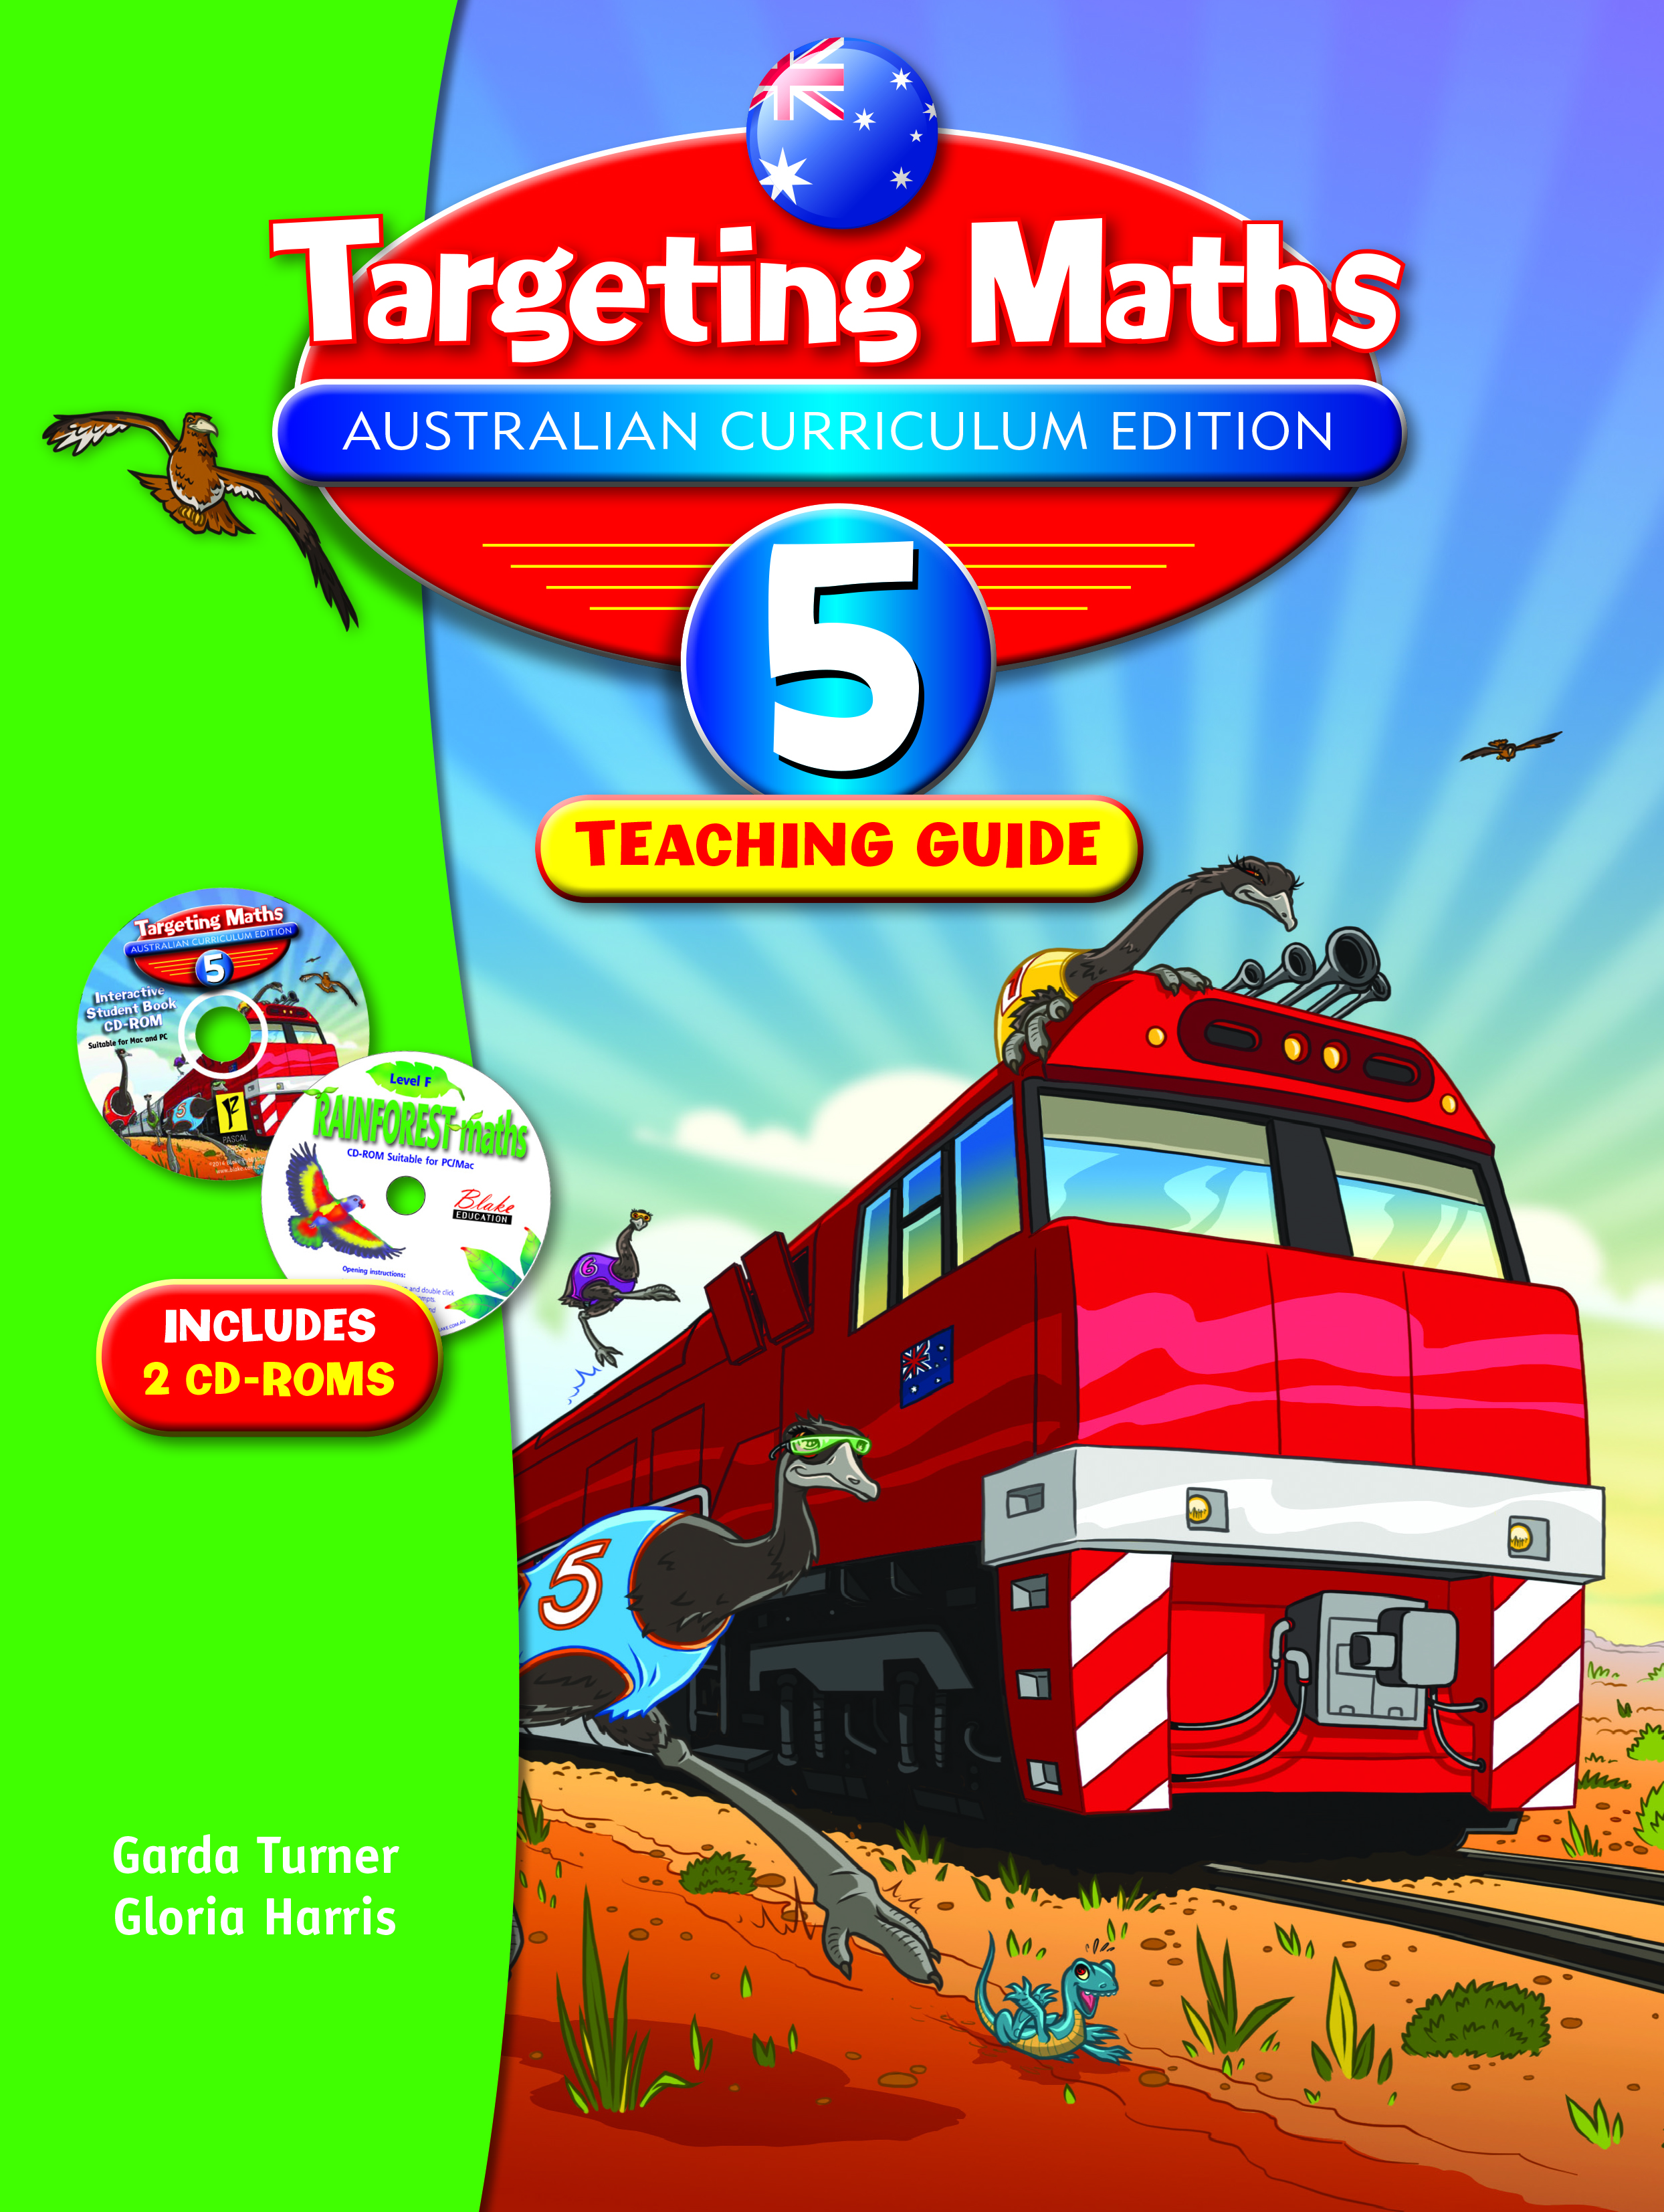 Targeting Maths Australian Curriculum Edition Teaching Guide Year 5